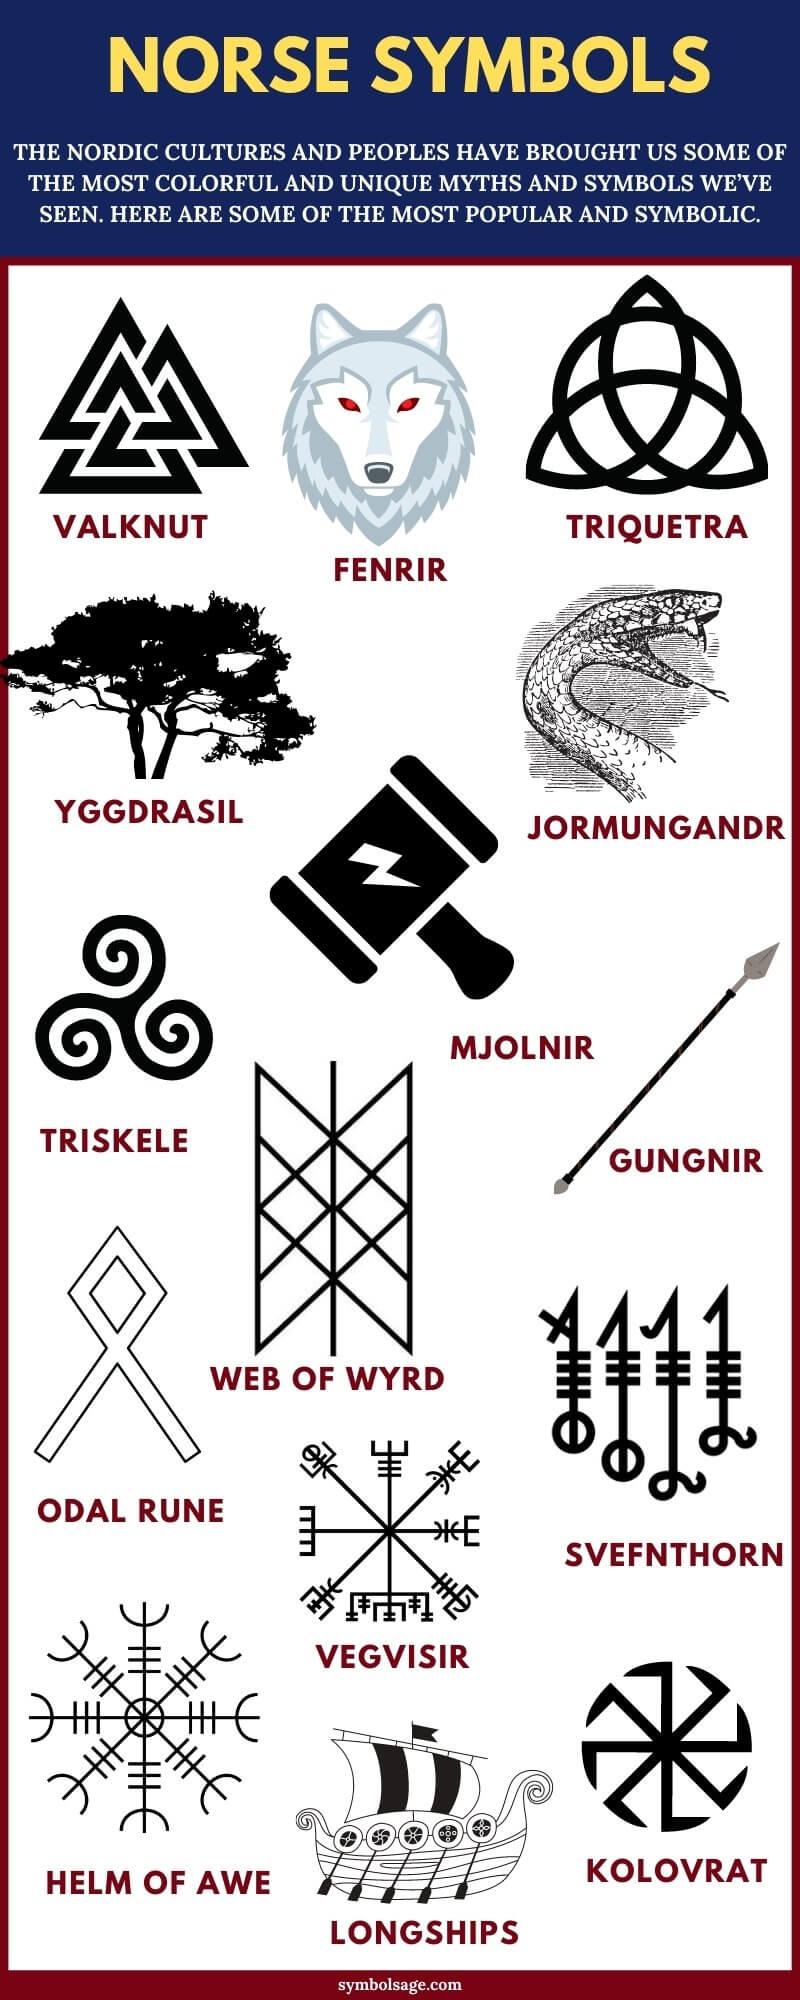 List of Norse symbols